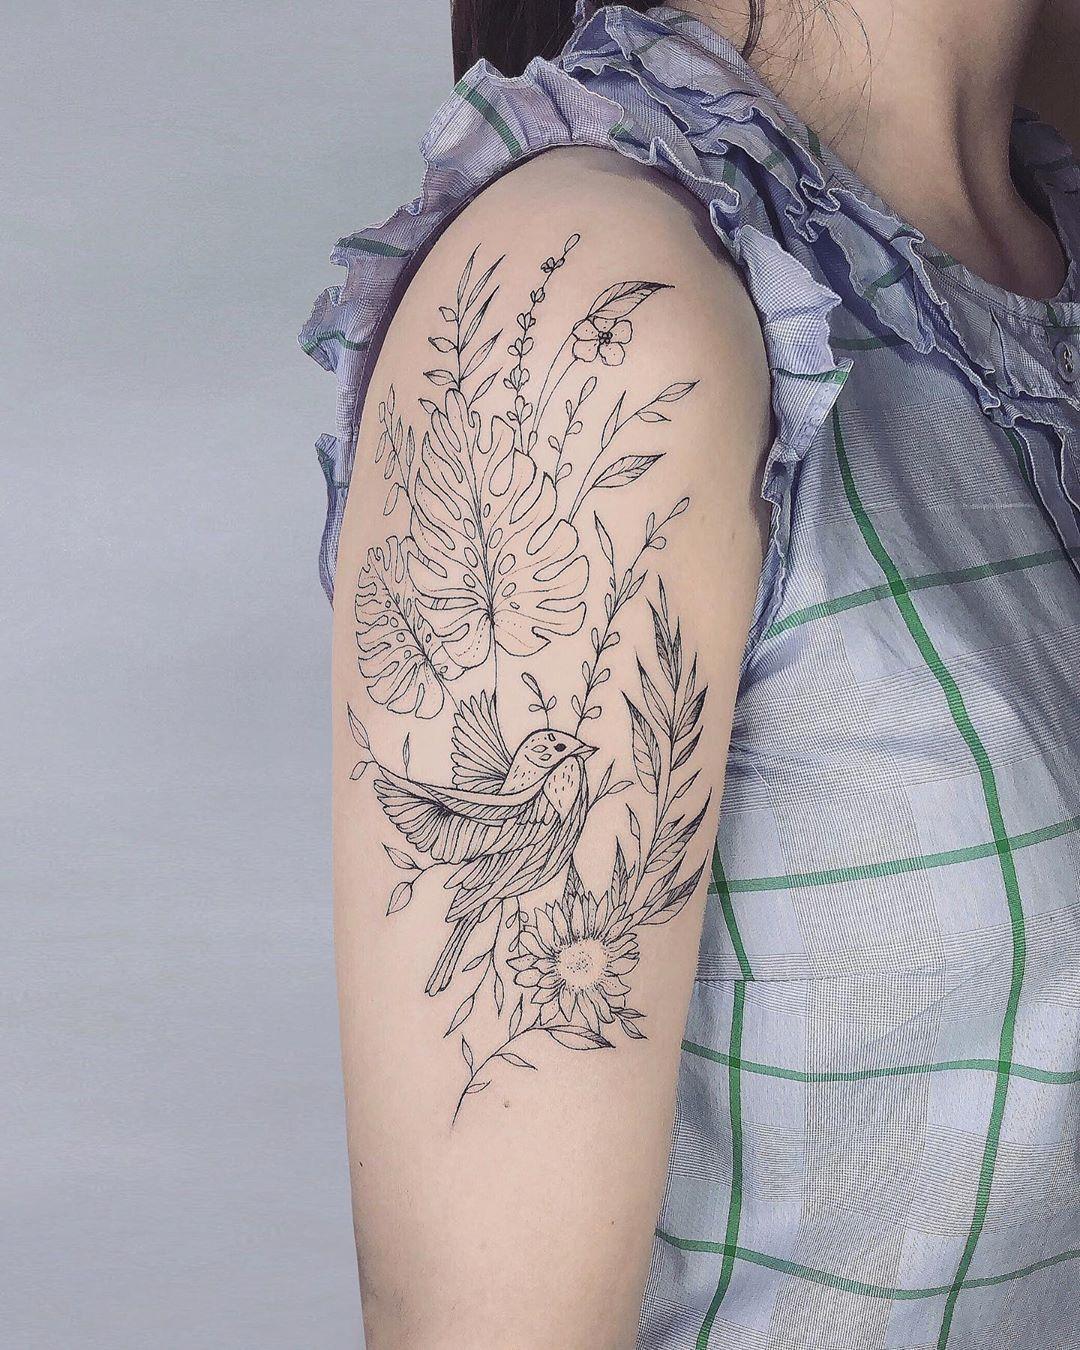 Bird & flowers 💐🤍 . . Bookings : lien dans ma bio |  link in my bio . . #lineflower #singleneedle #prettyflowers #bird #darkartists #blacktattooart #tattoodo #radtattoos #tattoo2me #btattooing #skinartmag #inkjunkeyz #thebesttattooartists #TAOT #tattooideas #onlyblackart #tattrx #flowerbouquet #floraltattooart #tattoooftheday #floraltattoos #tinyflowers #birdstattoo #flowerlove #fleurnoiretattoo #devinetatts #inkstinctsubmission #inkus